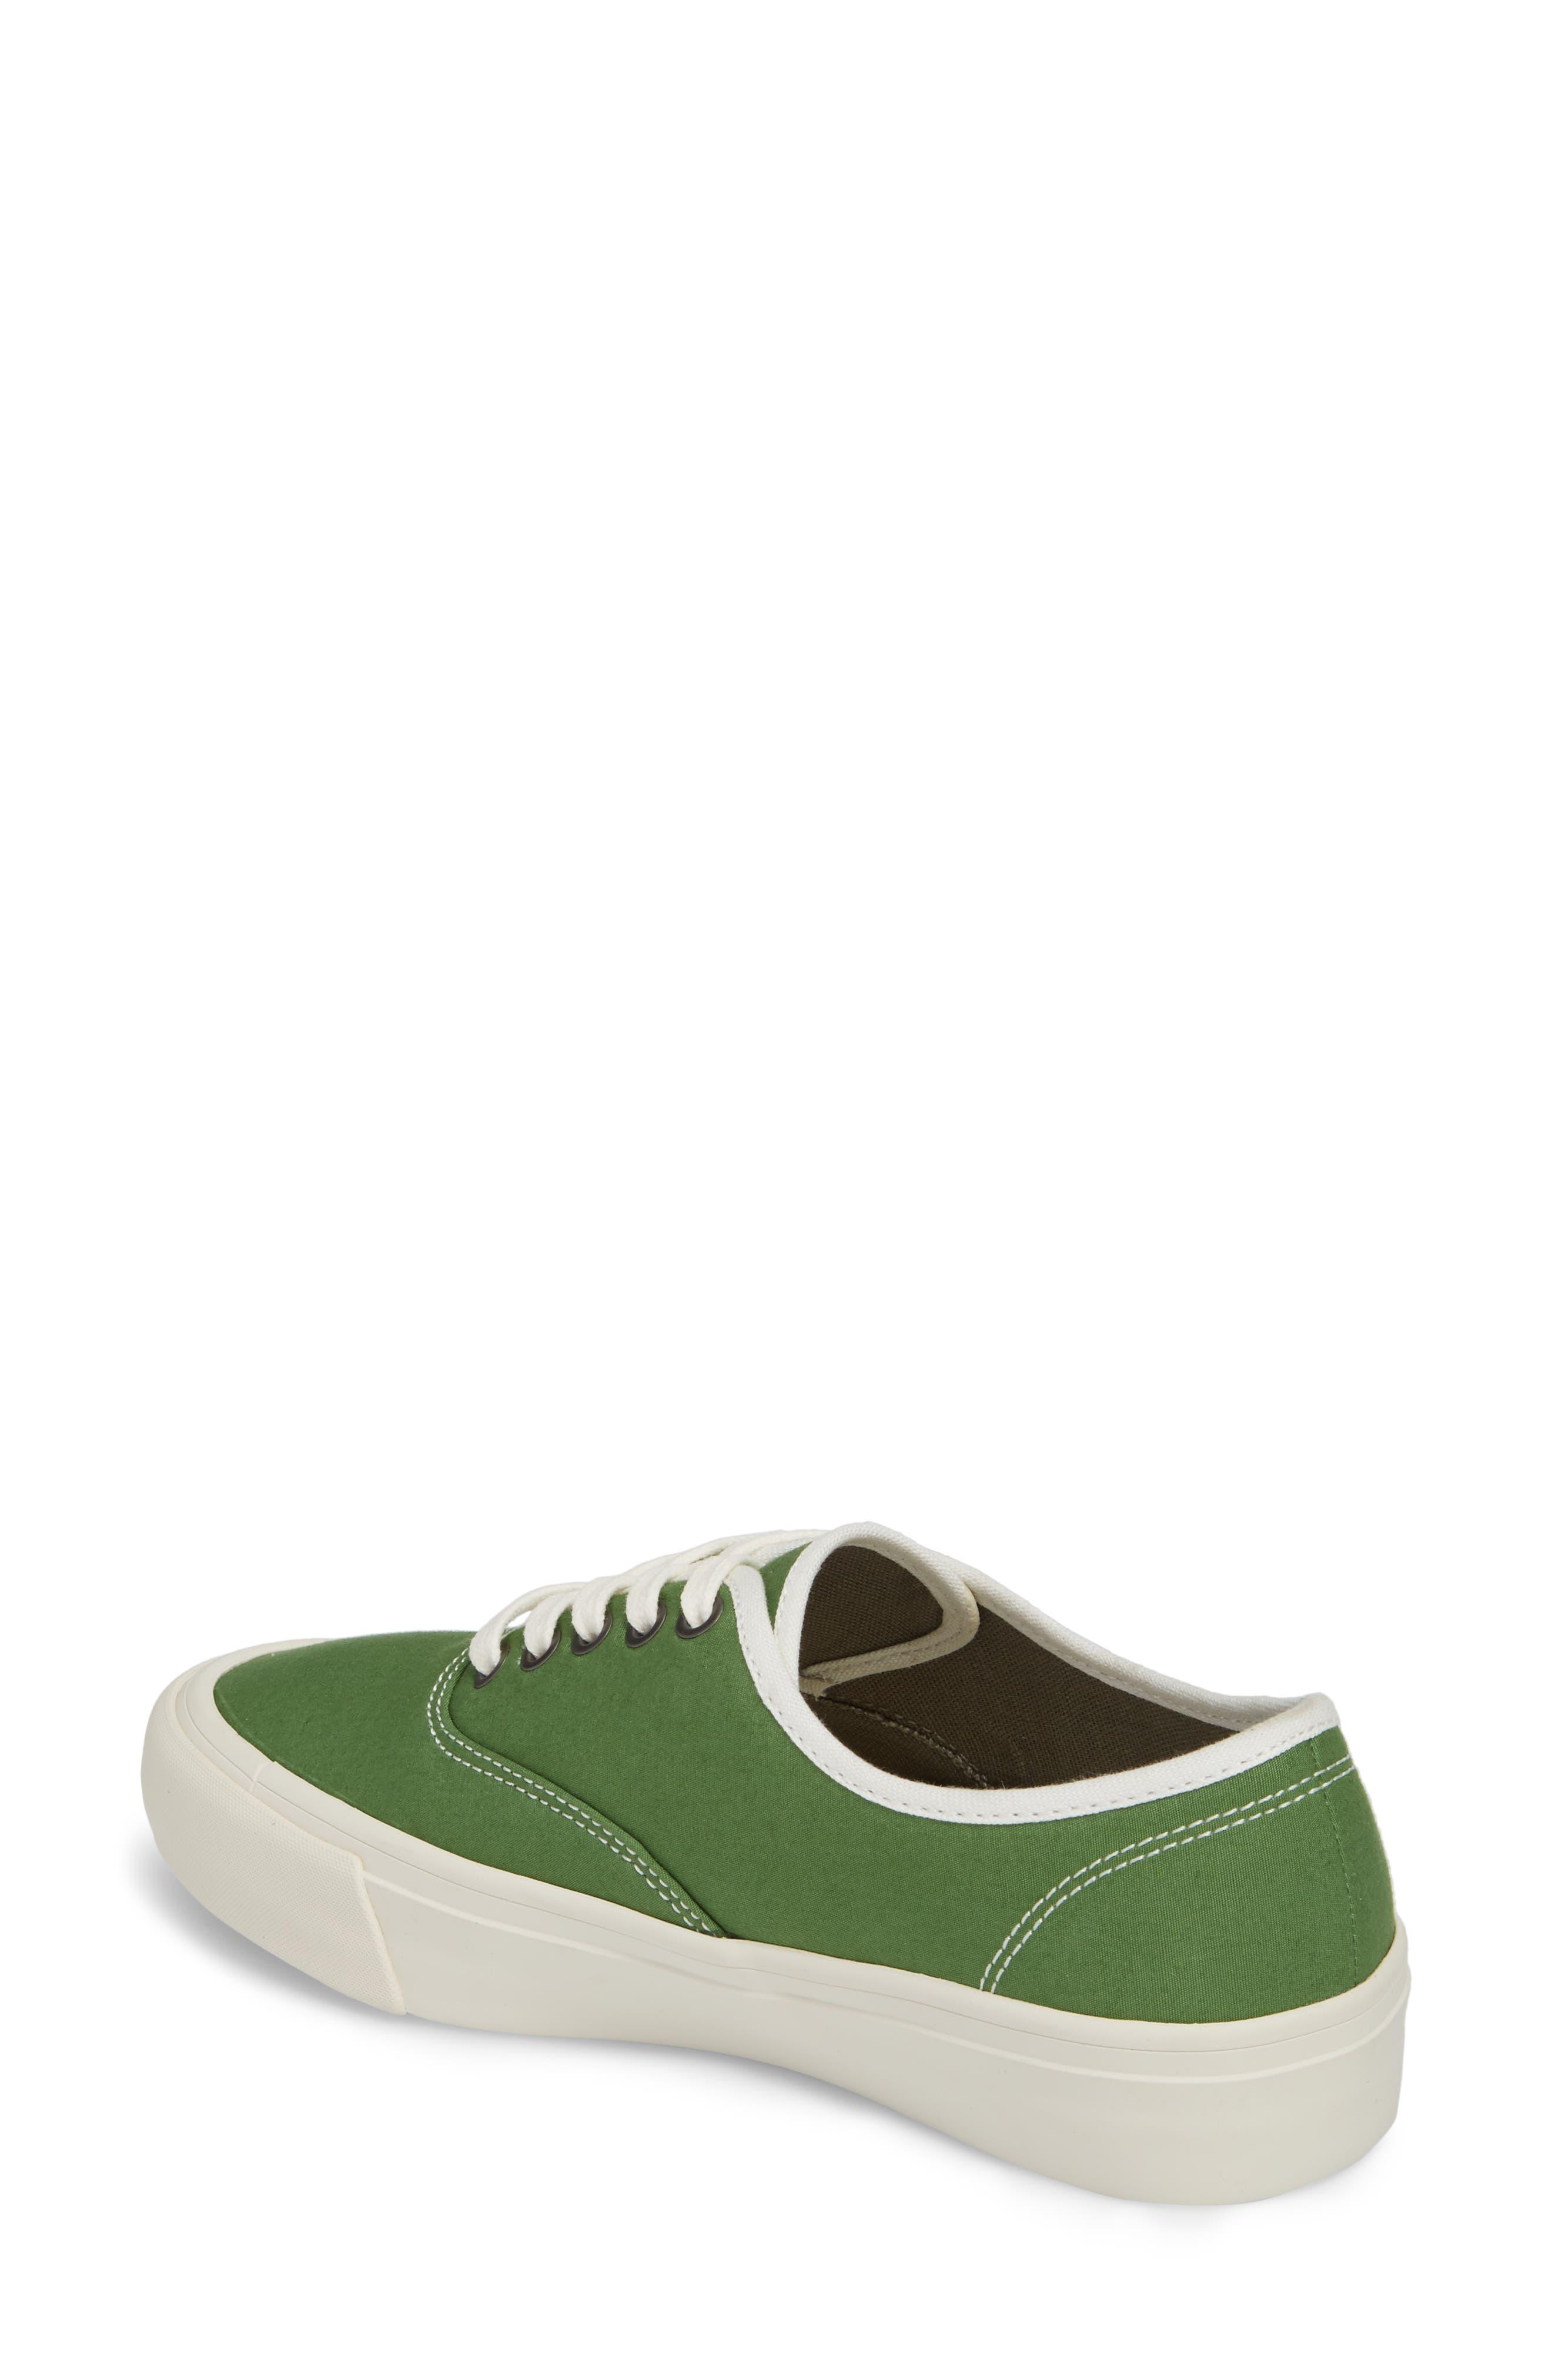 SEAVEES,                             Legend Standard Sneaker,                             Alternate thumbnail 2, color,                             CACTUS